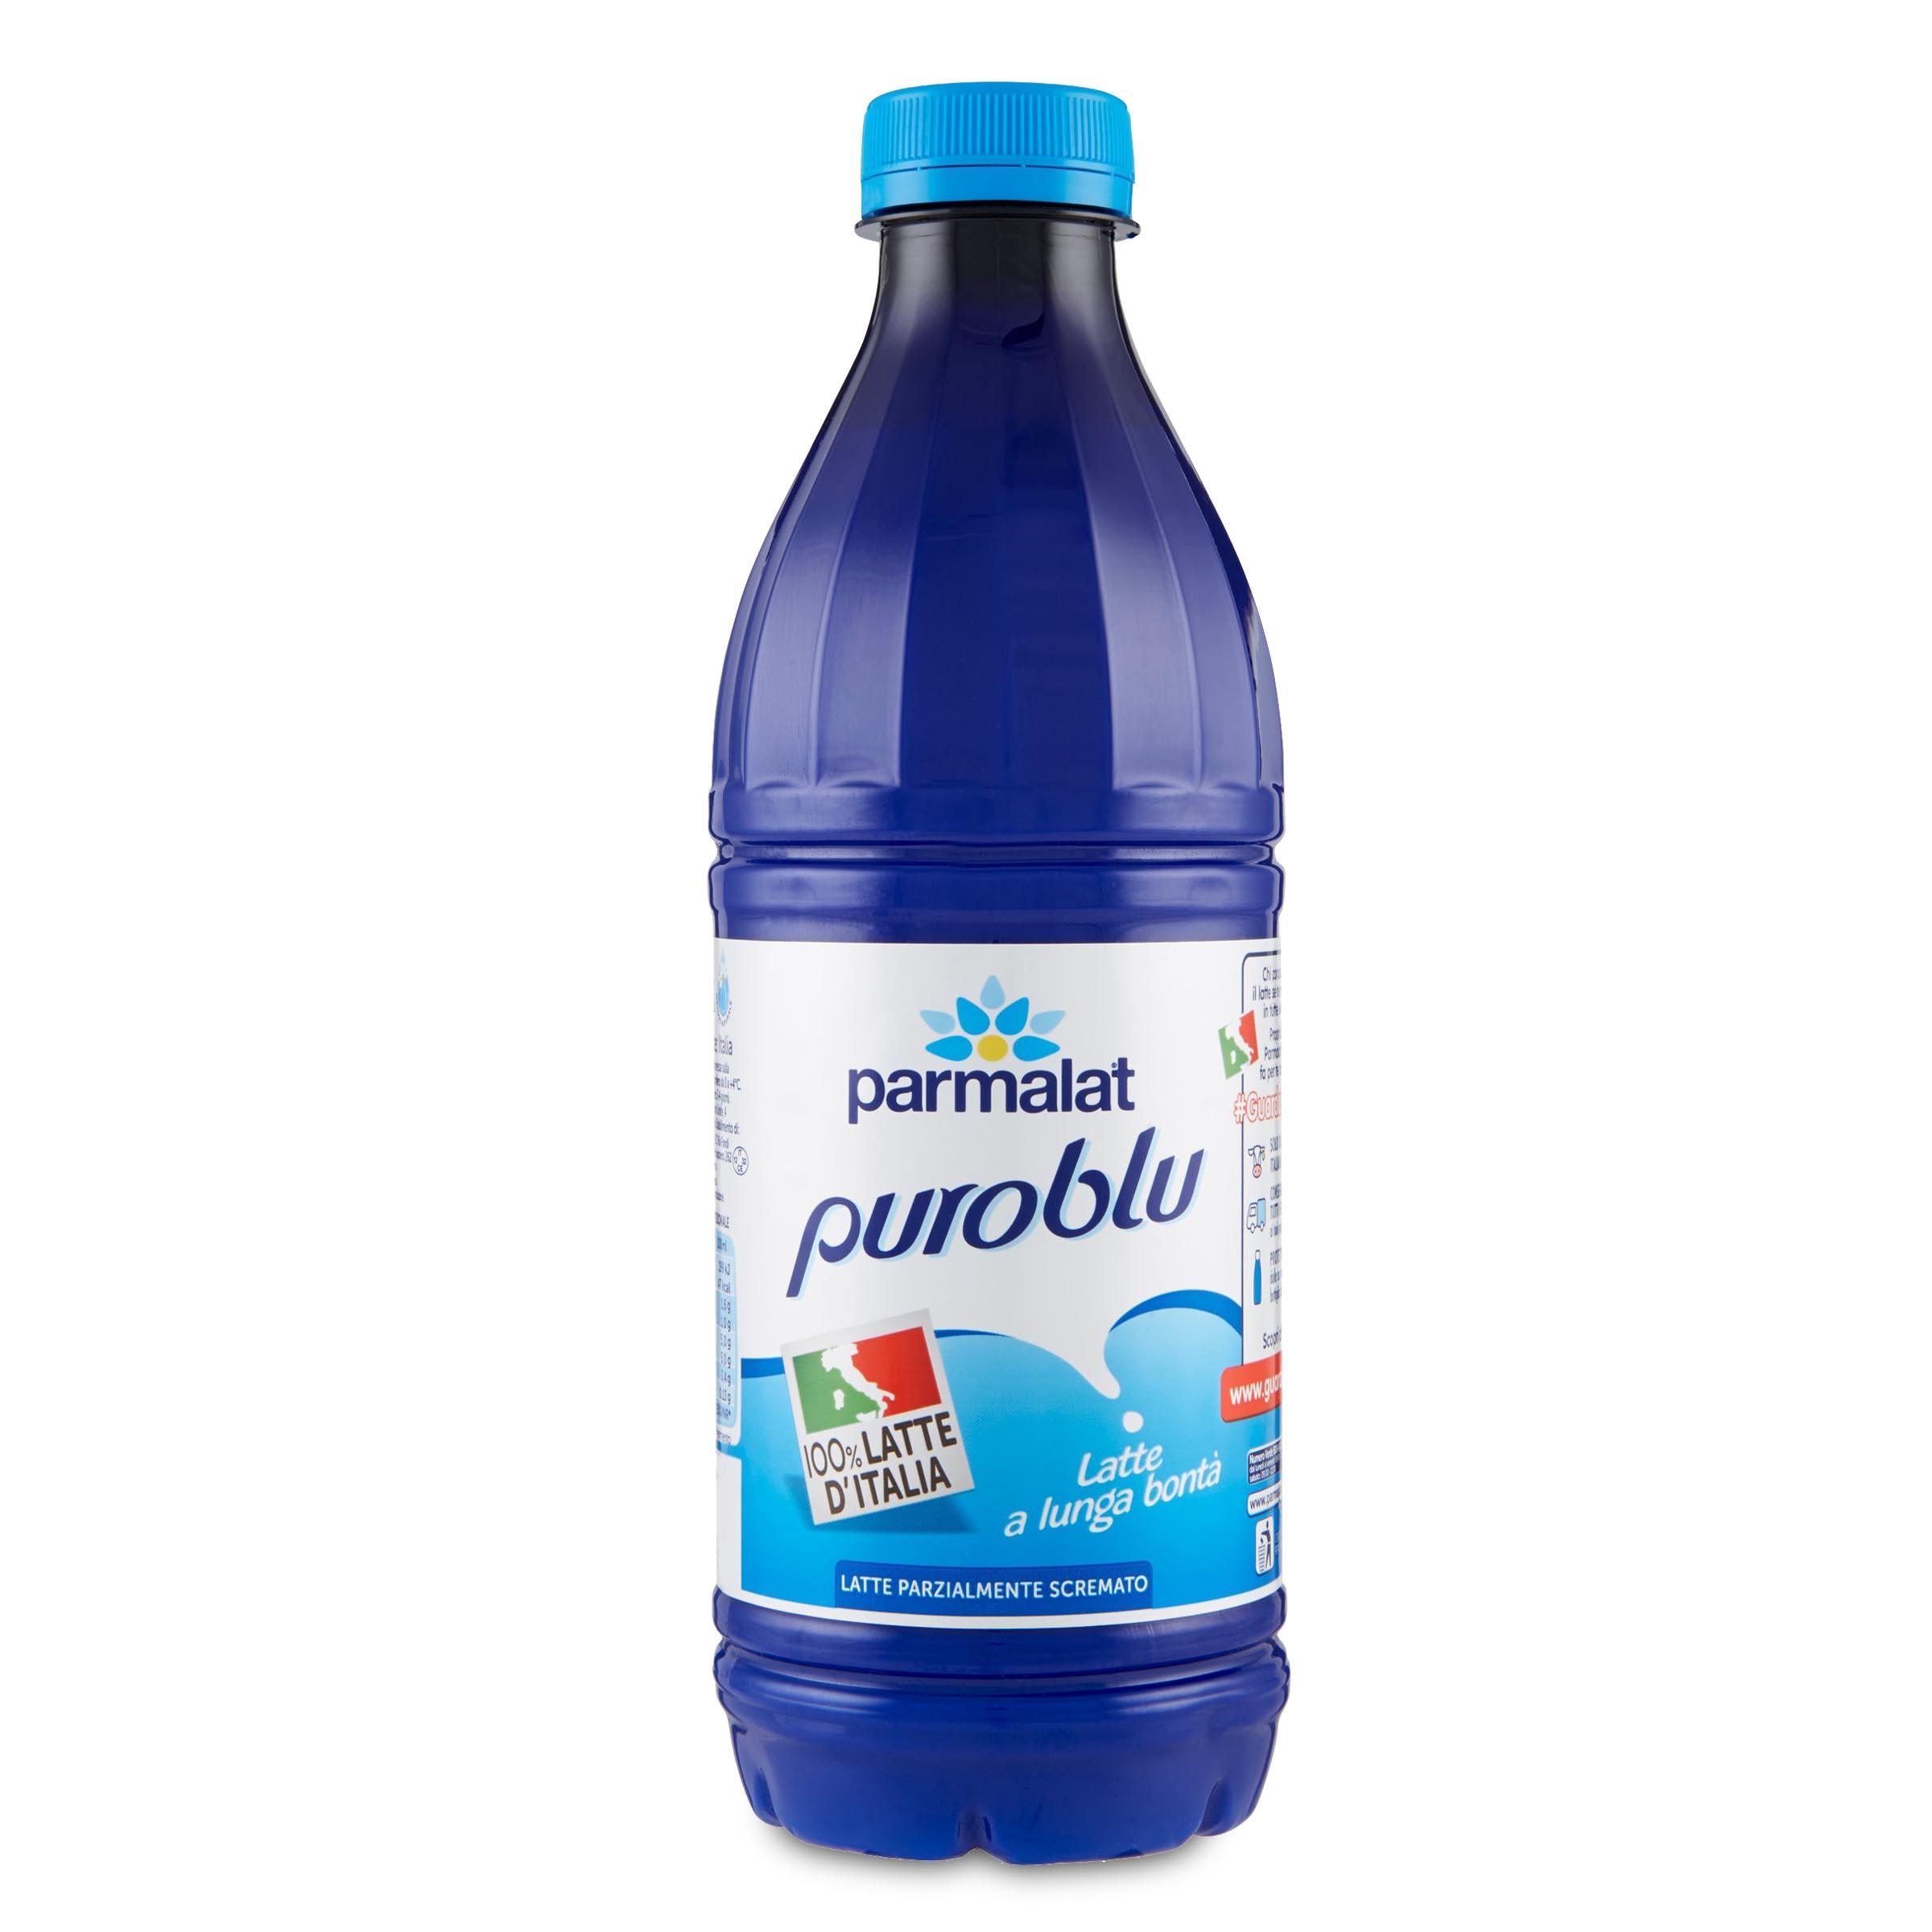 Latte-Parzialmente-Scremato-Parmalat